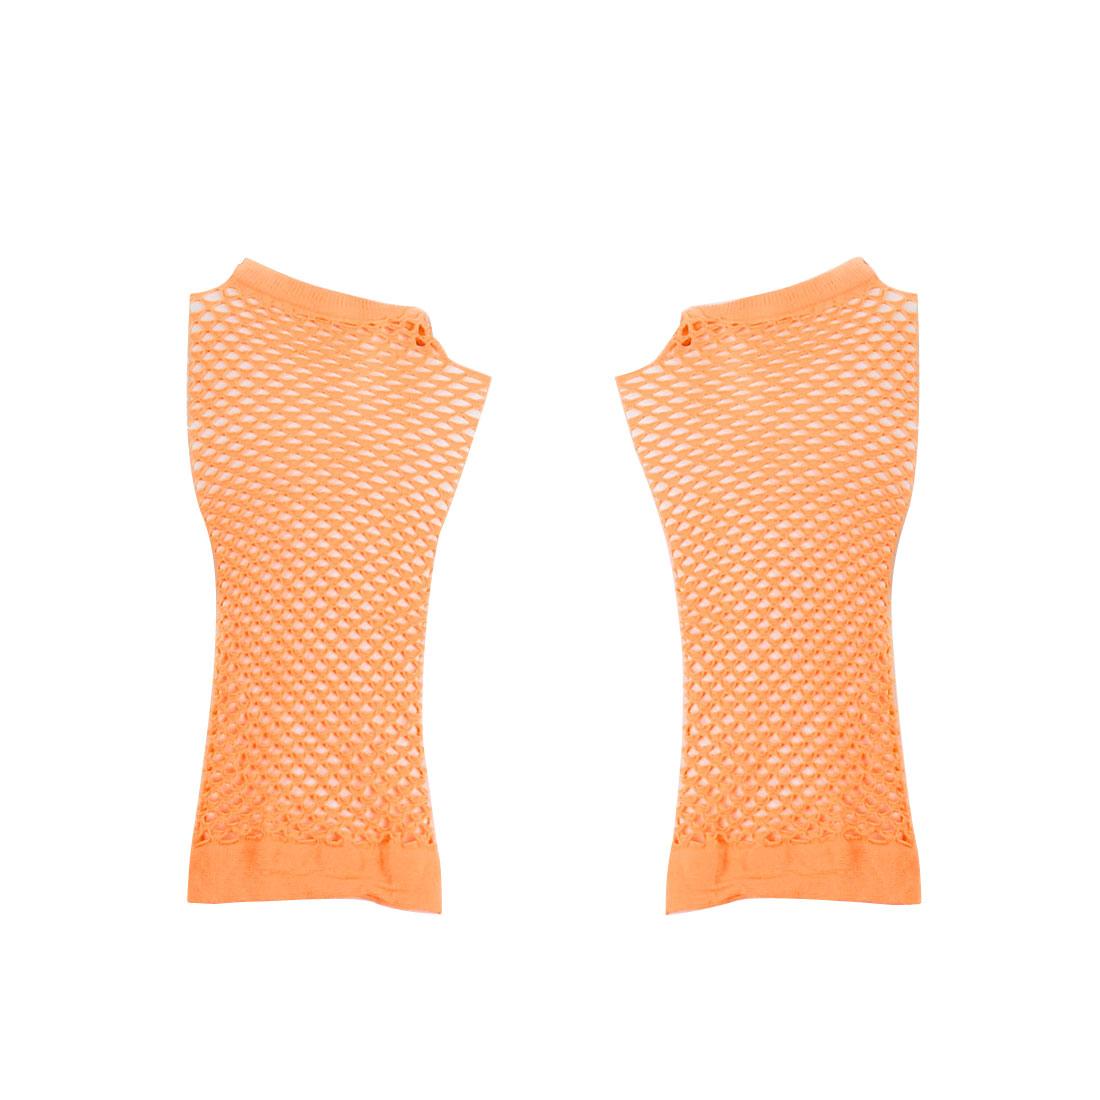 Pair Lady Elastic Fishnet Fingerless Elbow Length Gloves Arm Warmers Pale Orange